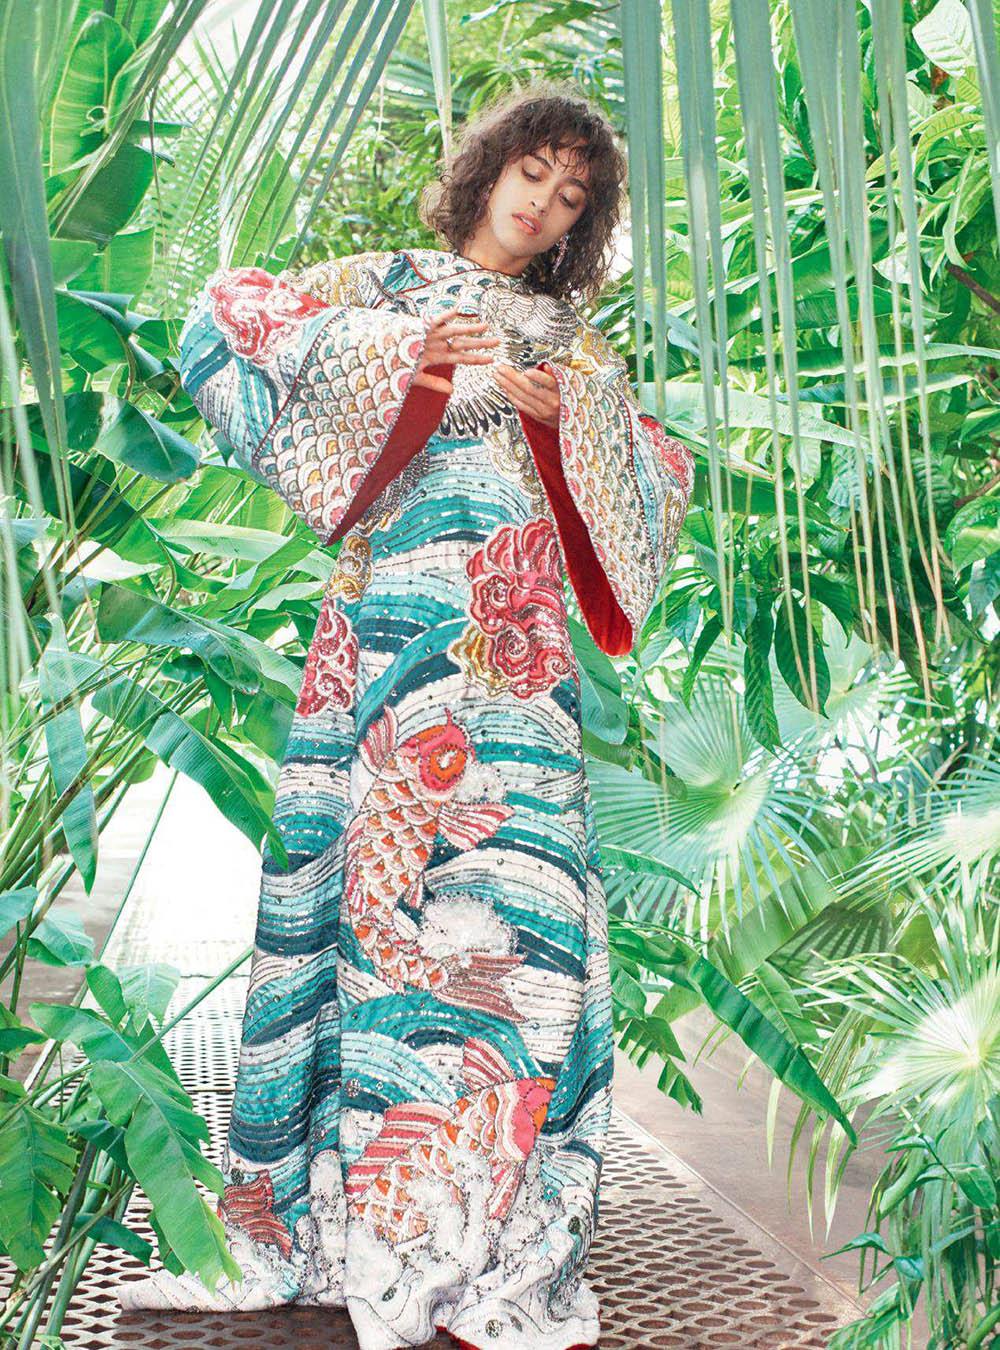 Alanna Arrington by Michelangelo di Battista for Harper's Bazaar UK May 2018